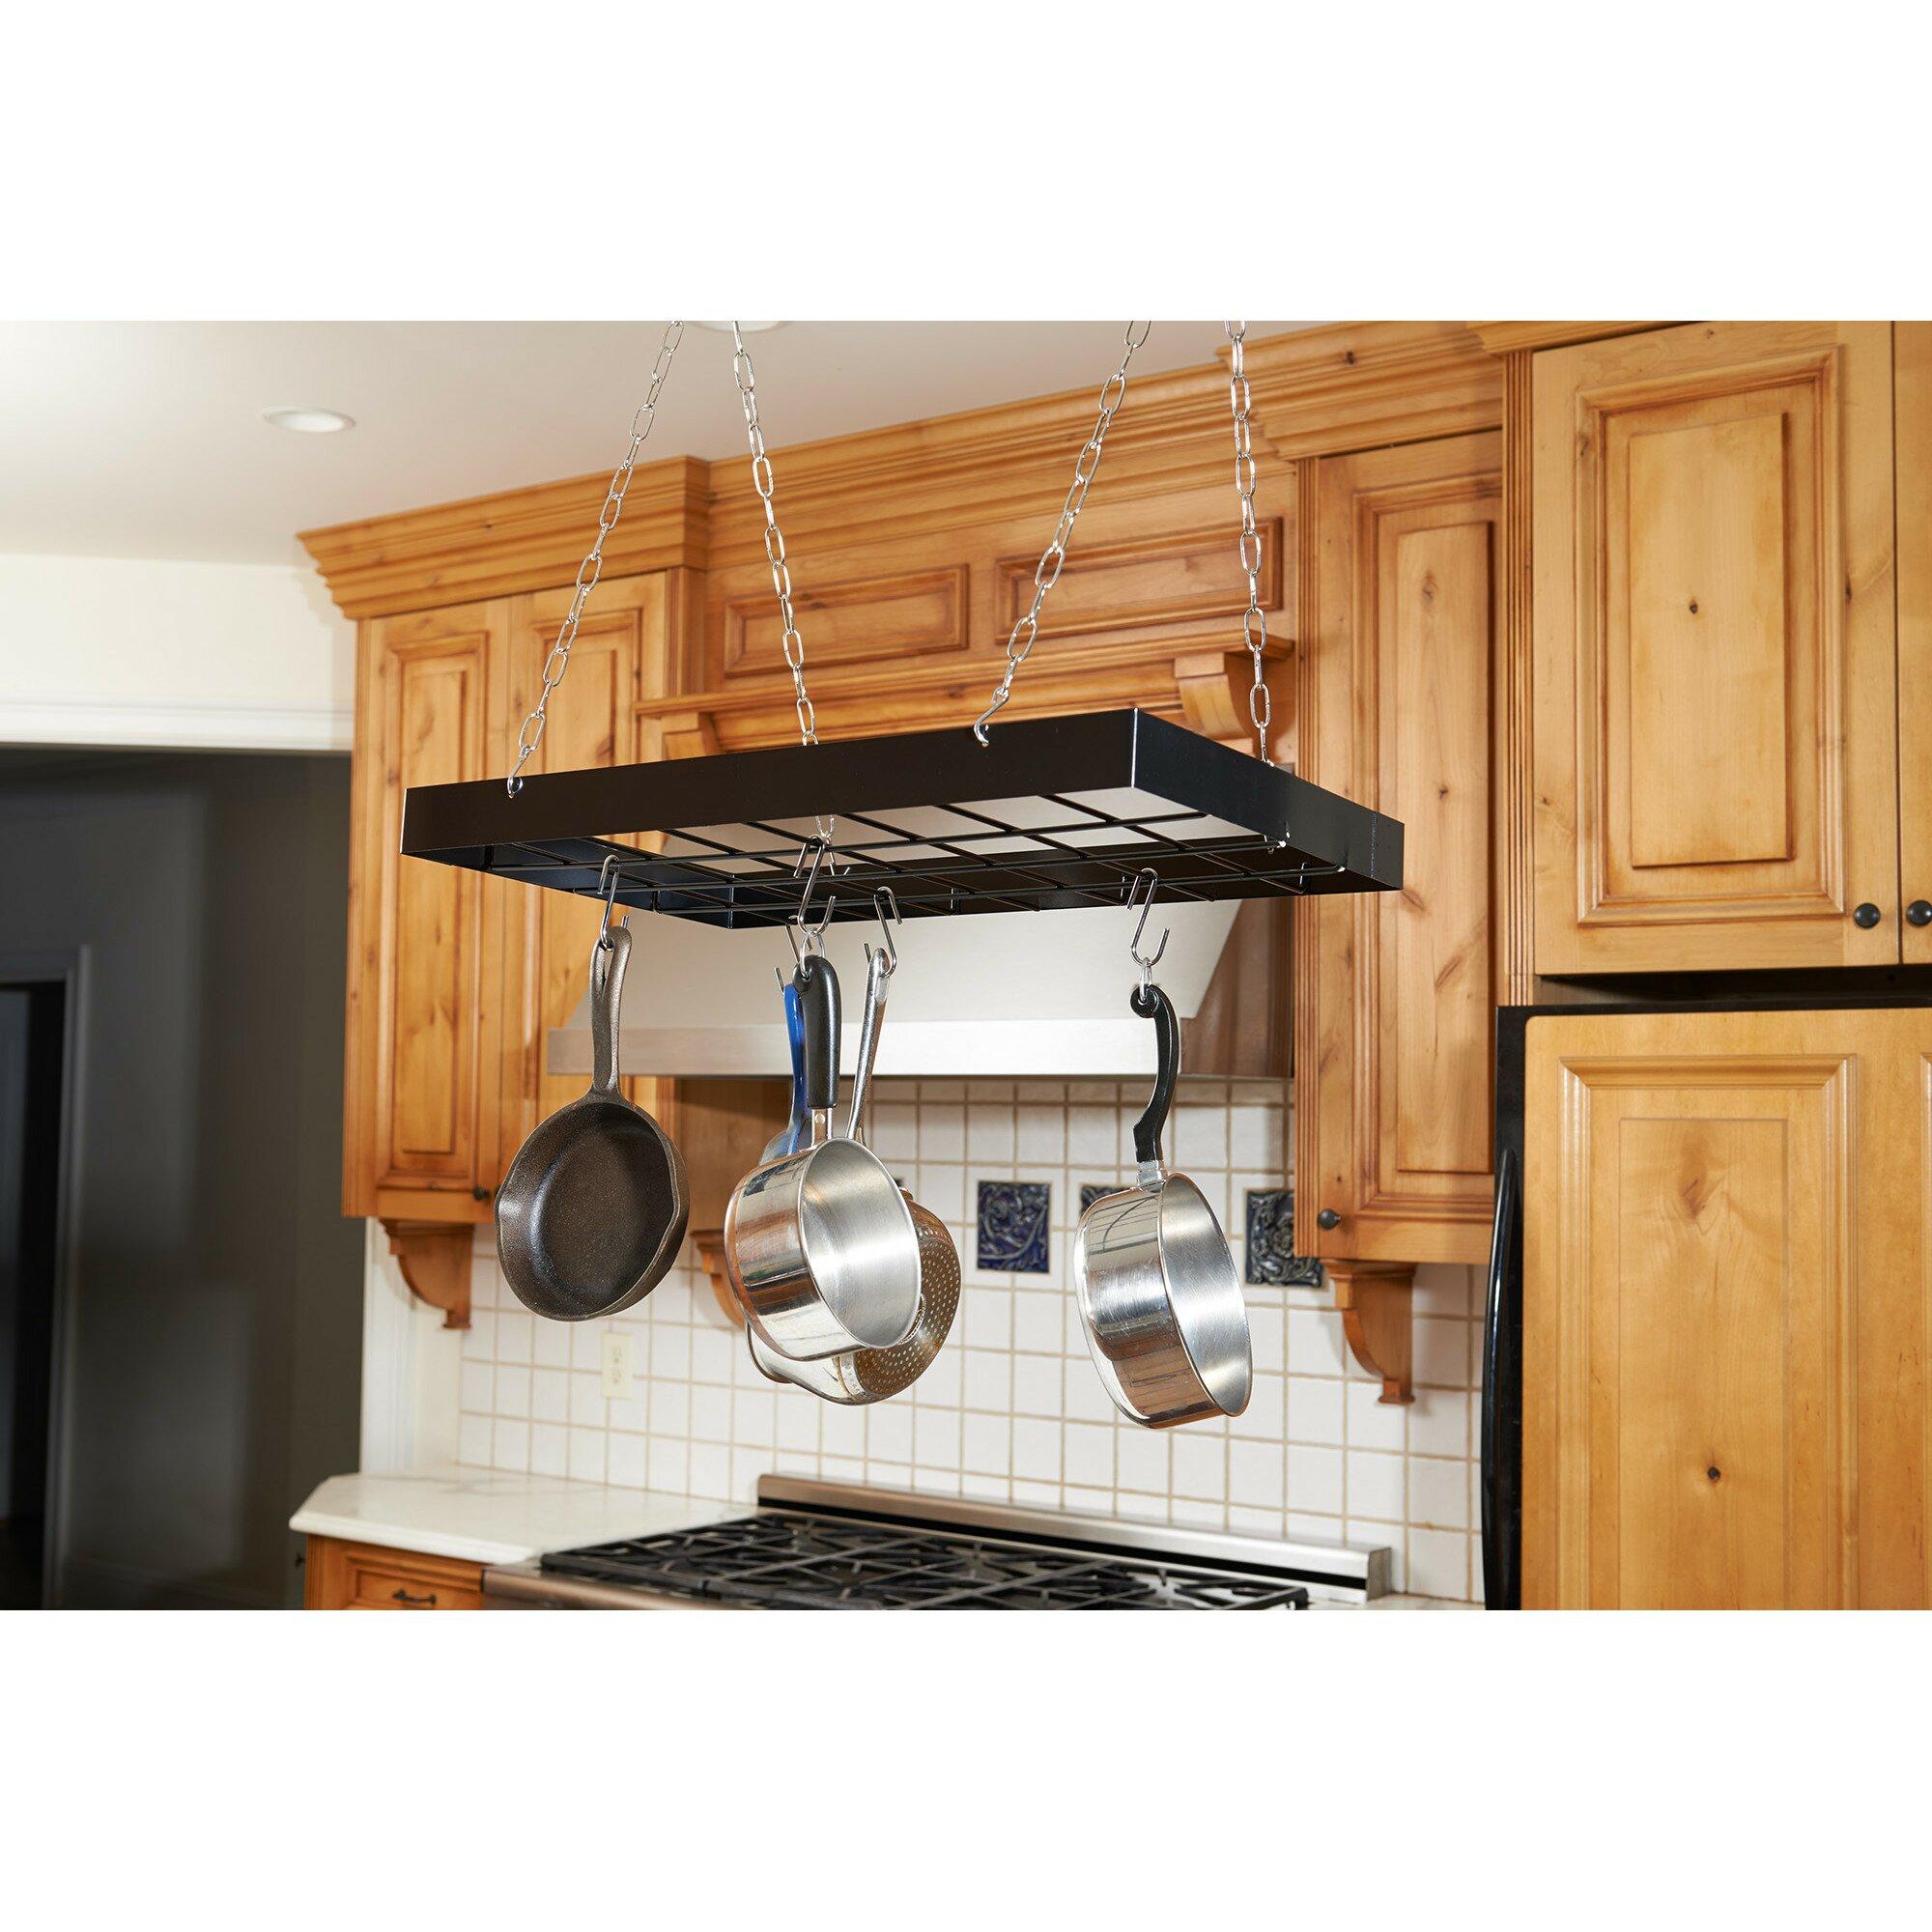 Pot and pan hanger for kitchen - Rectangular Hanging Pot Rack